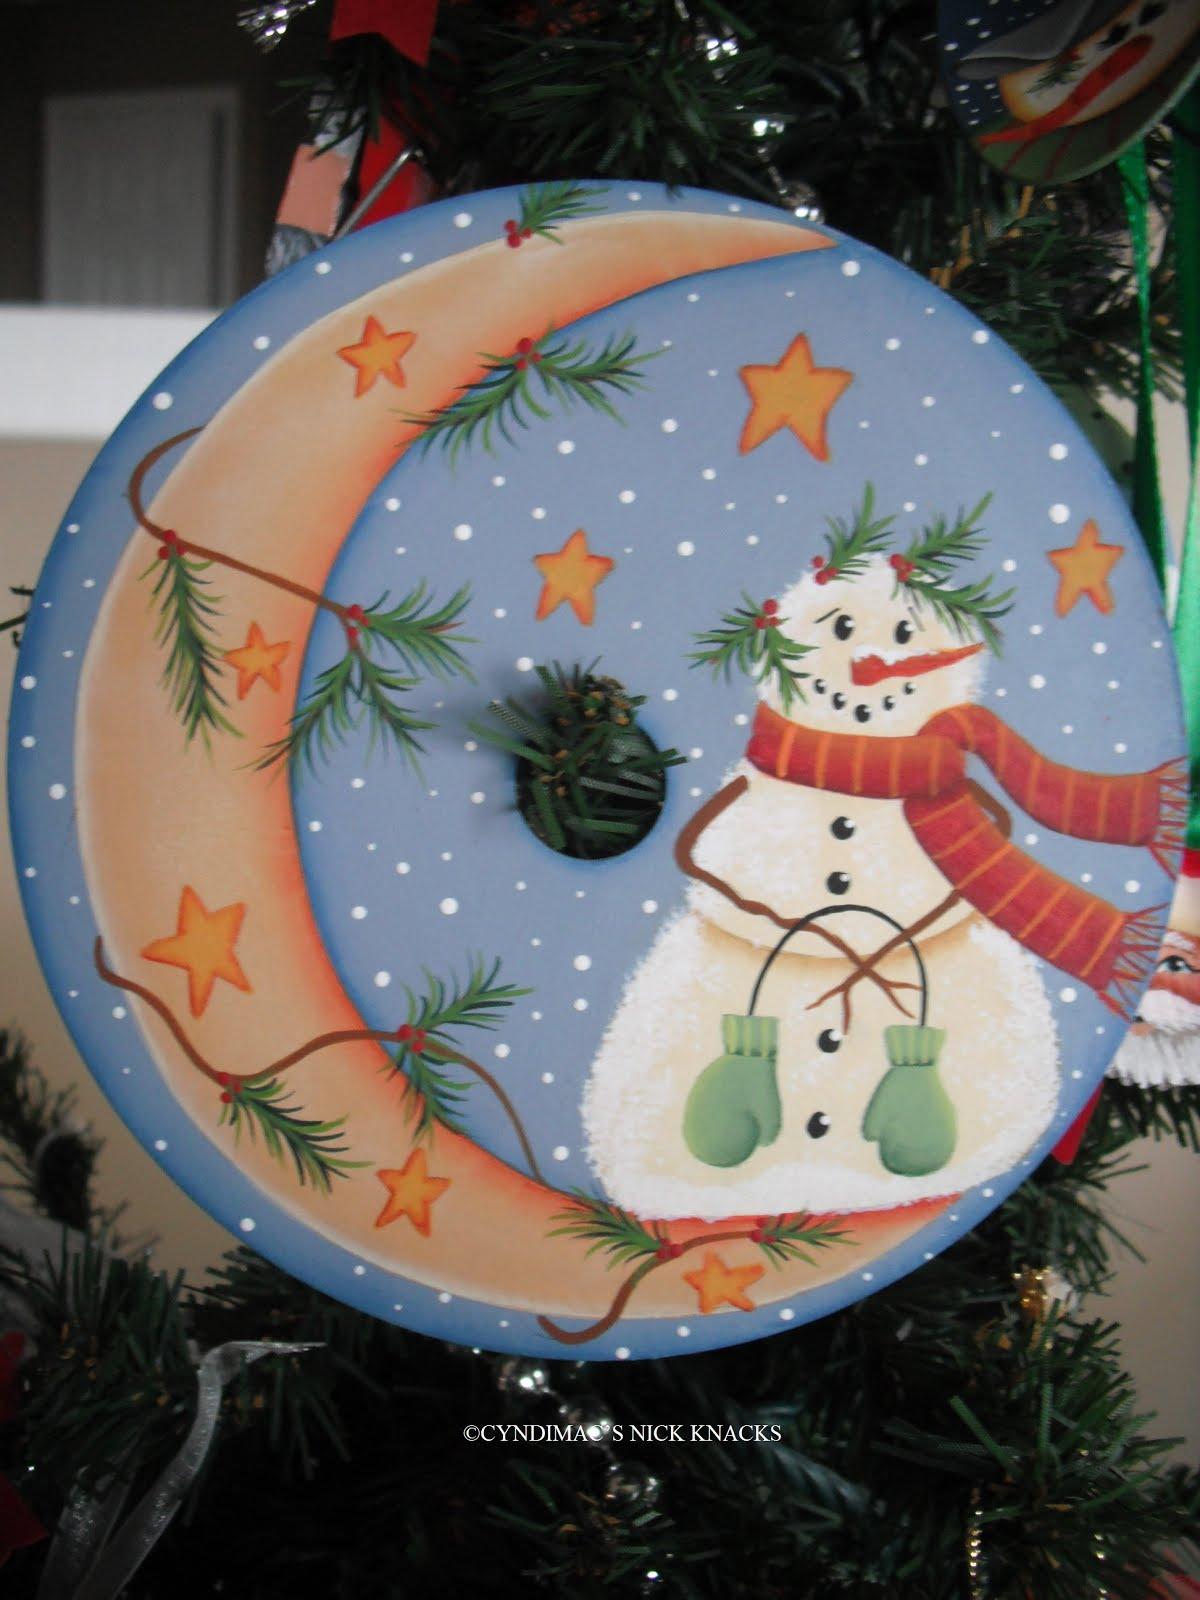 Cyndimac S Nick Knacks Cd Ornaments